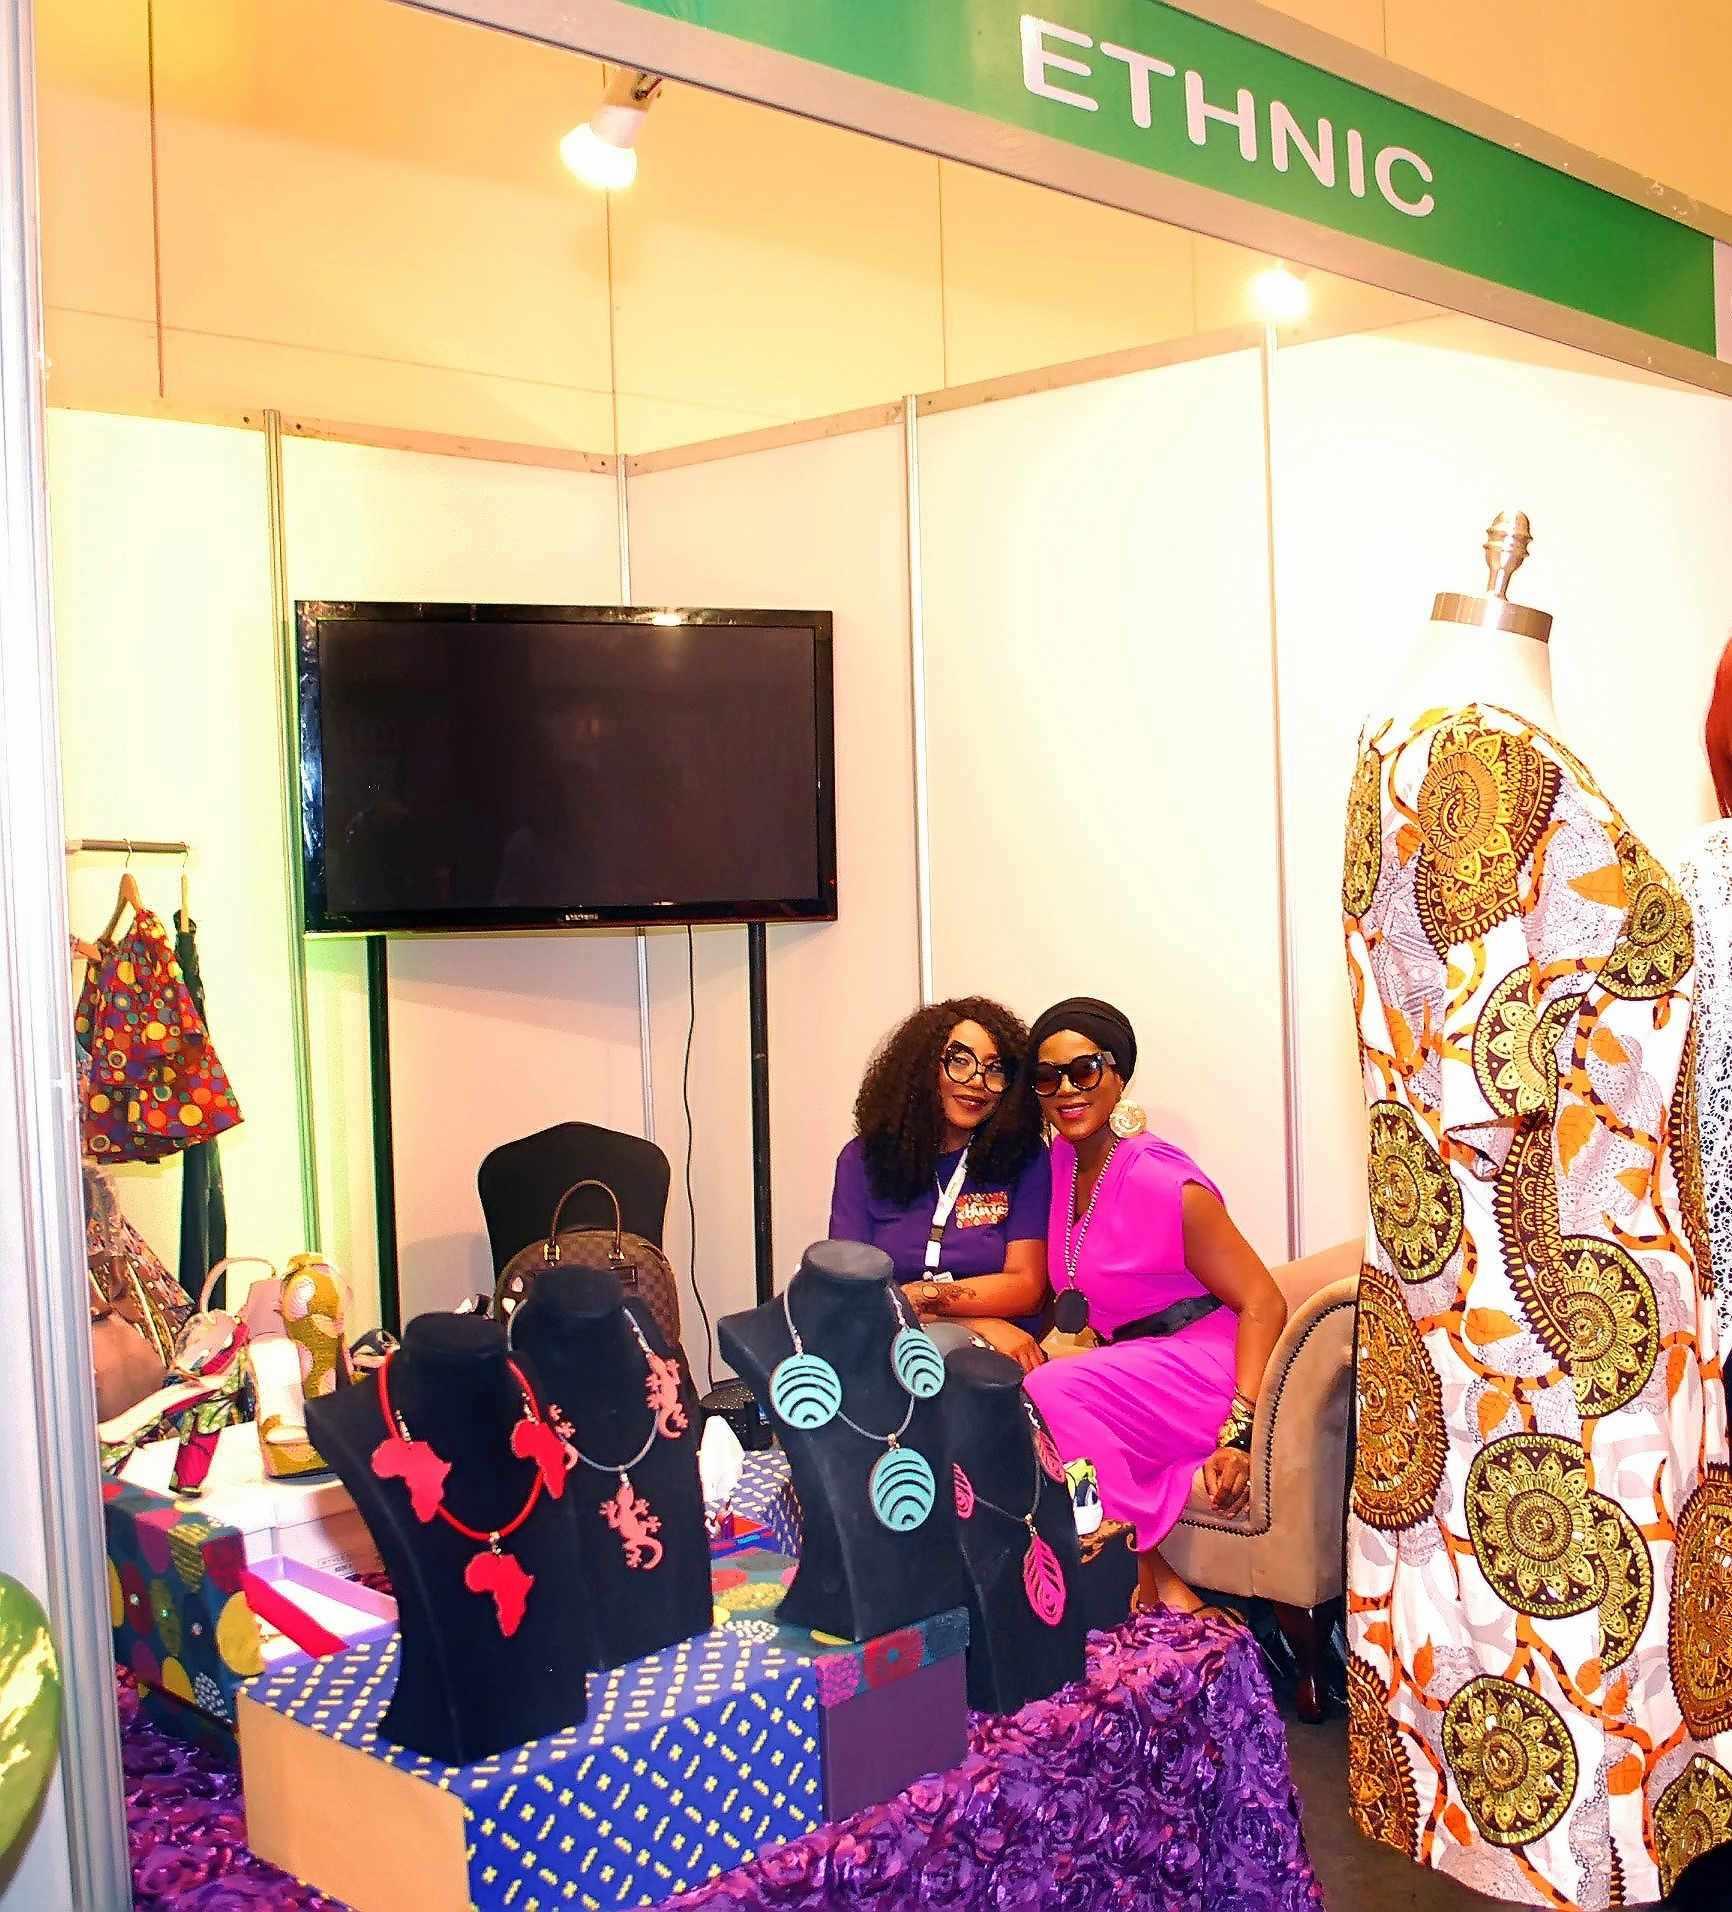 Creative director of Ethnic.ng, Cleopatra Robinson with Stephanie Okereke-Linus,